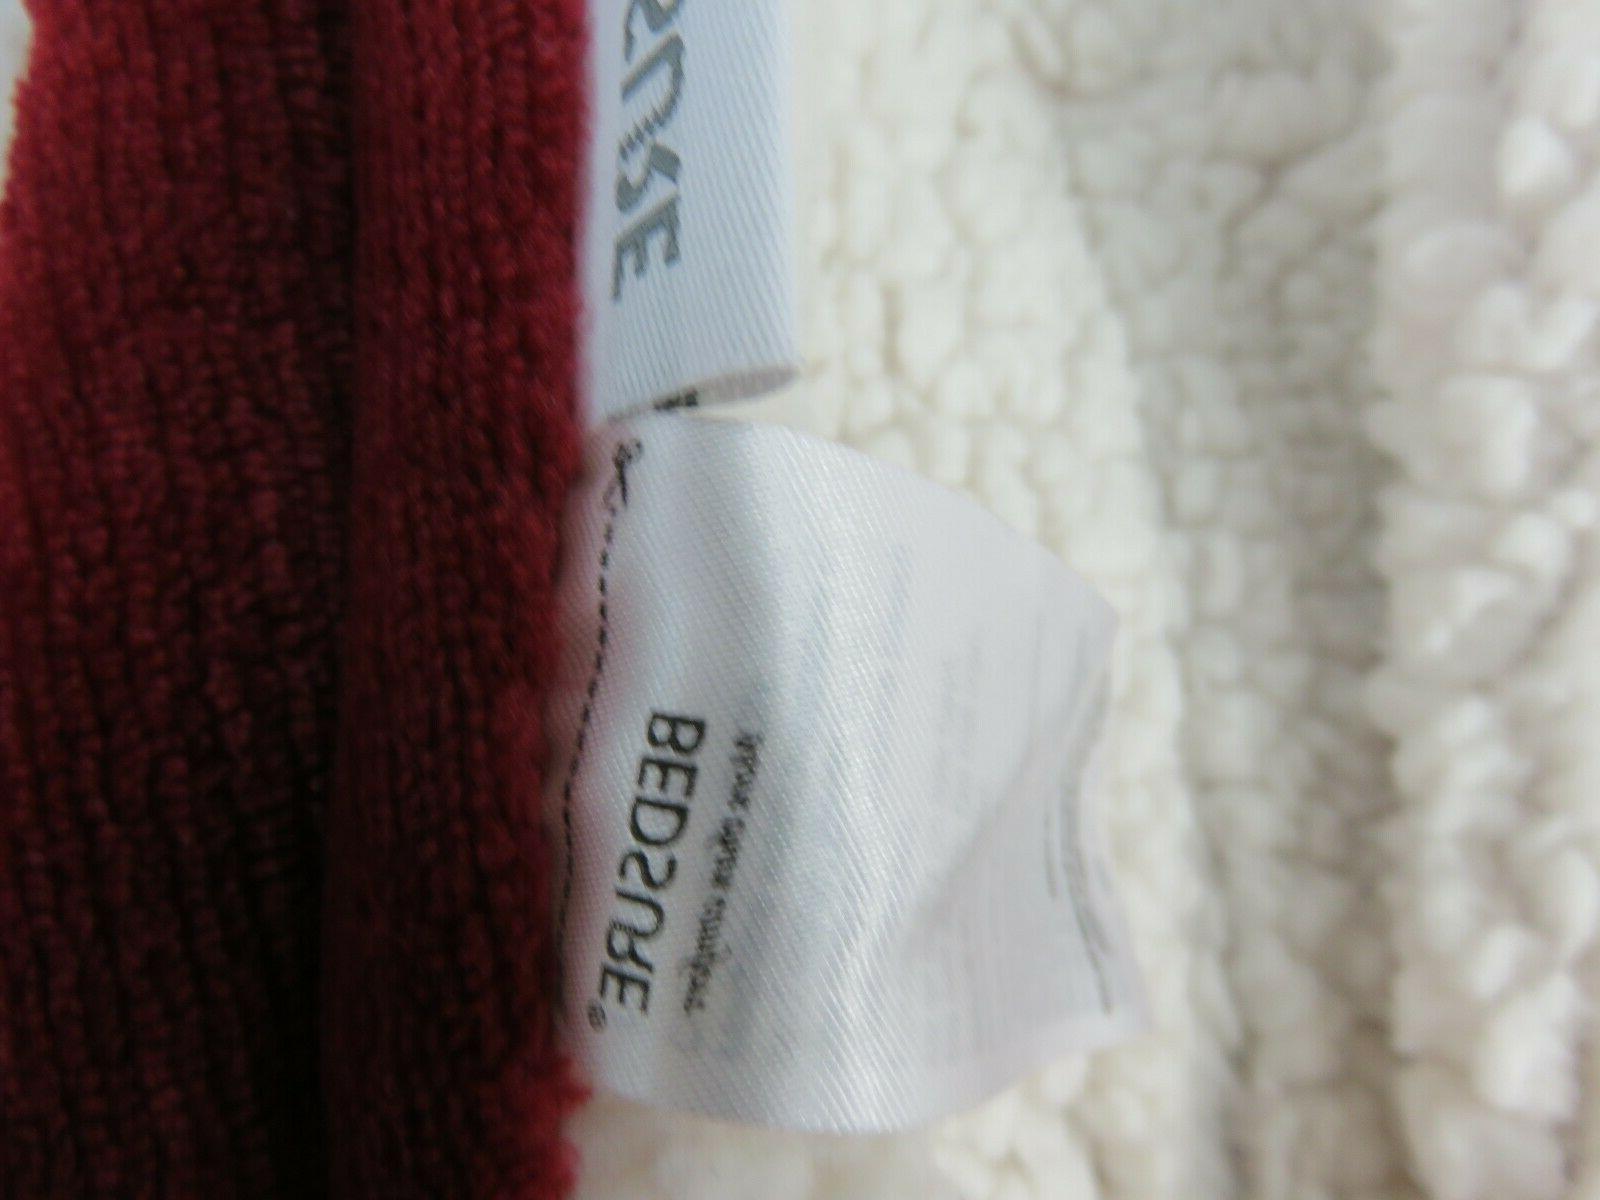 BEDSURE Fleece Blanket 65in x Plush Soft